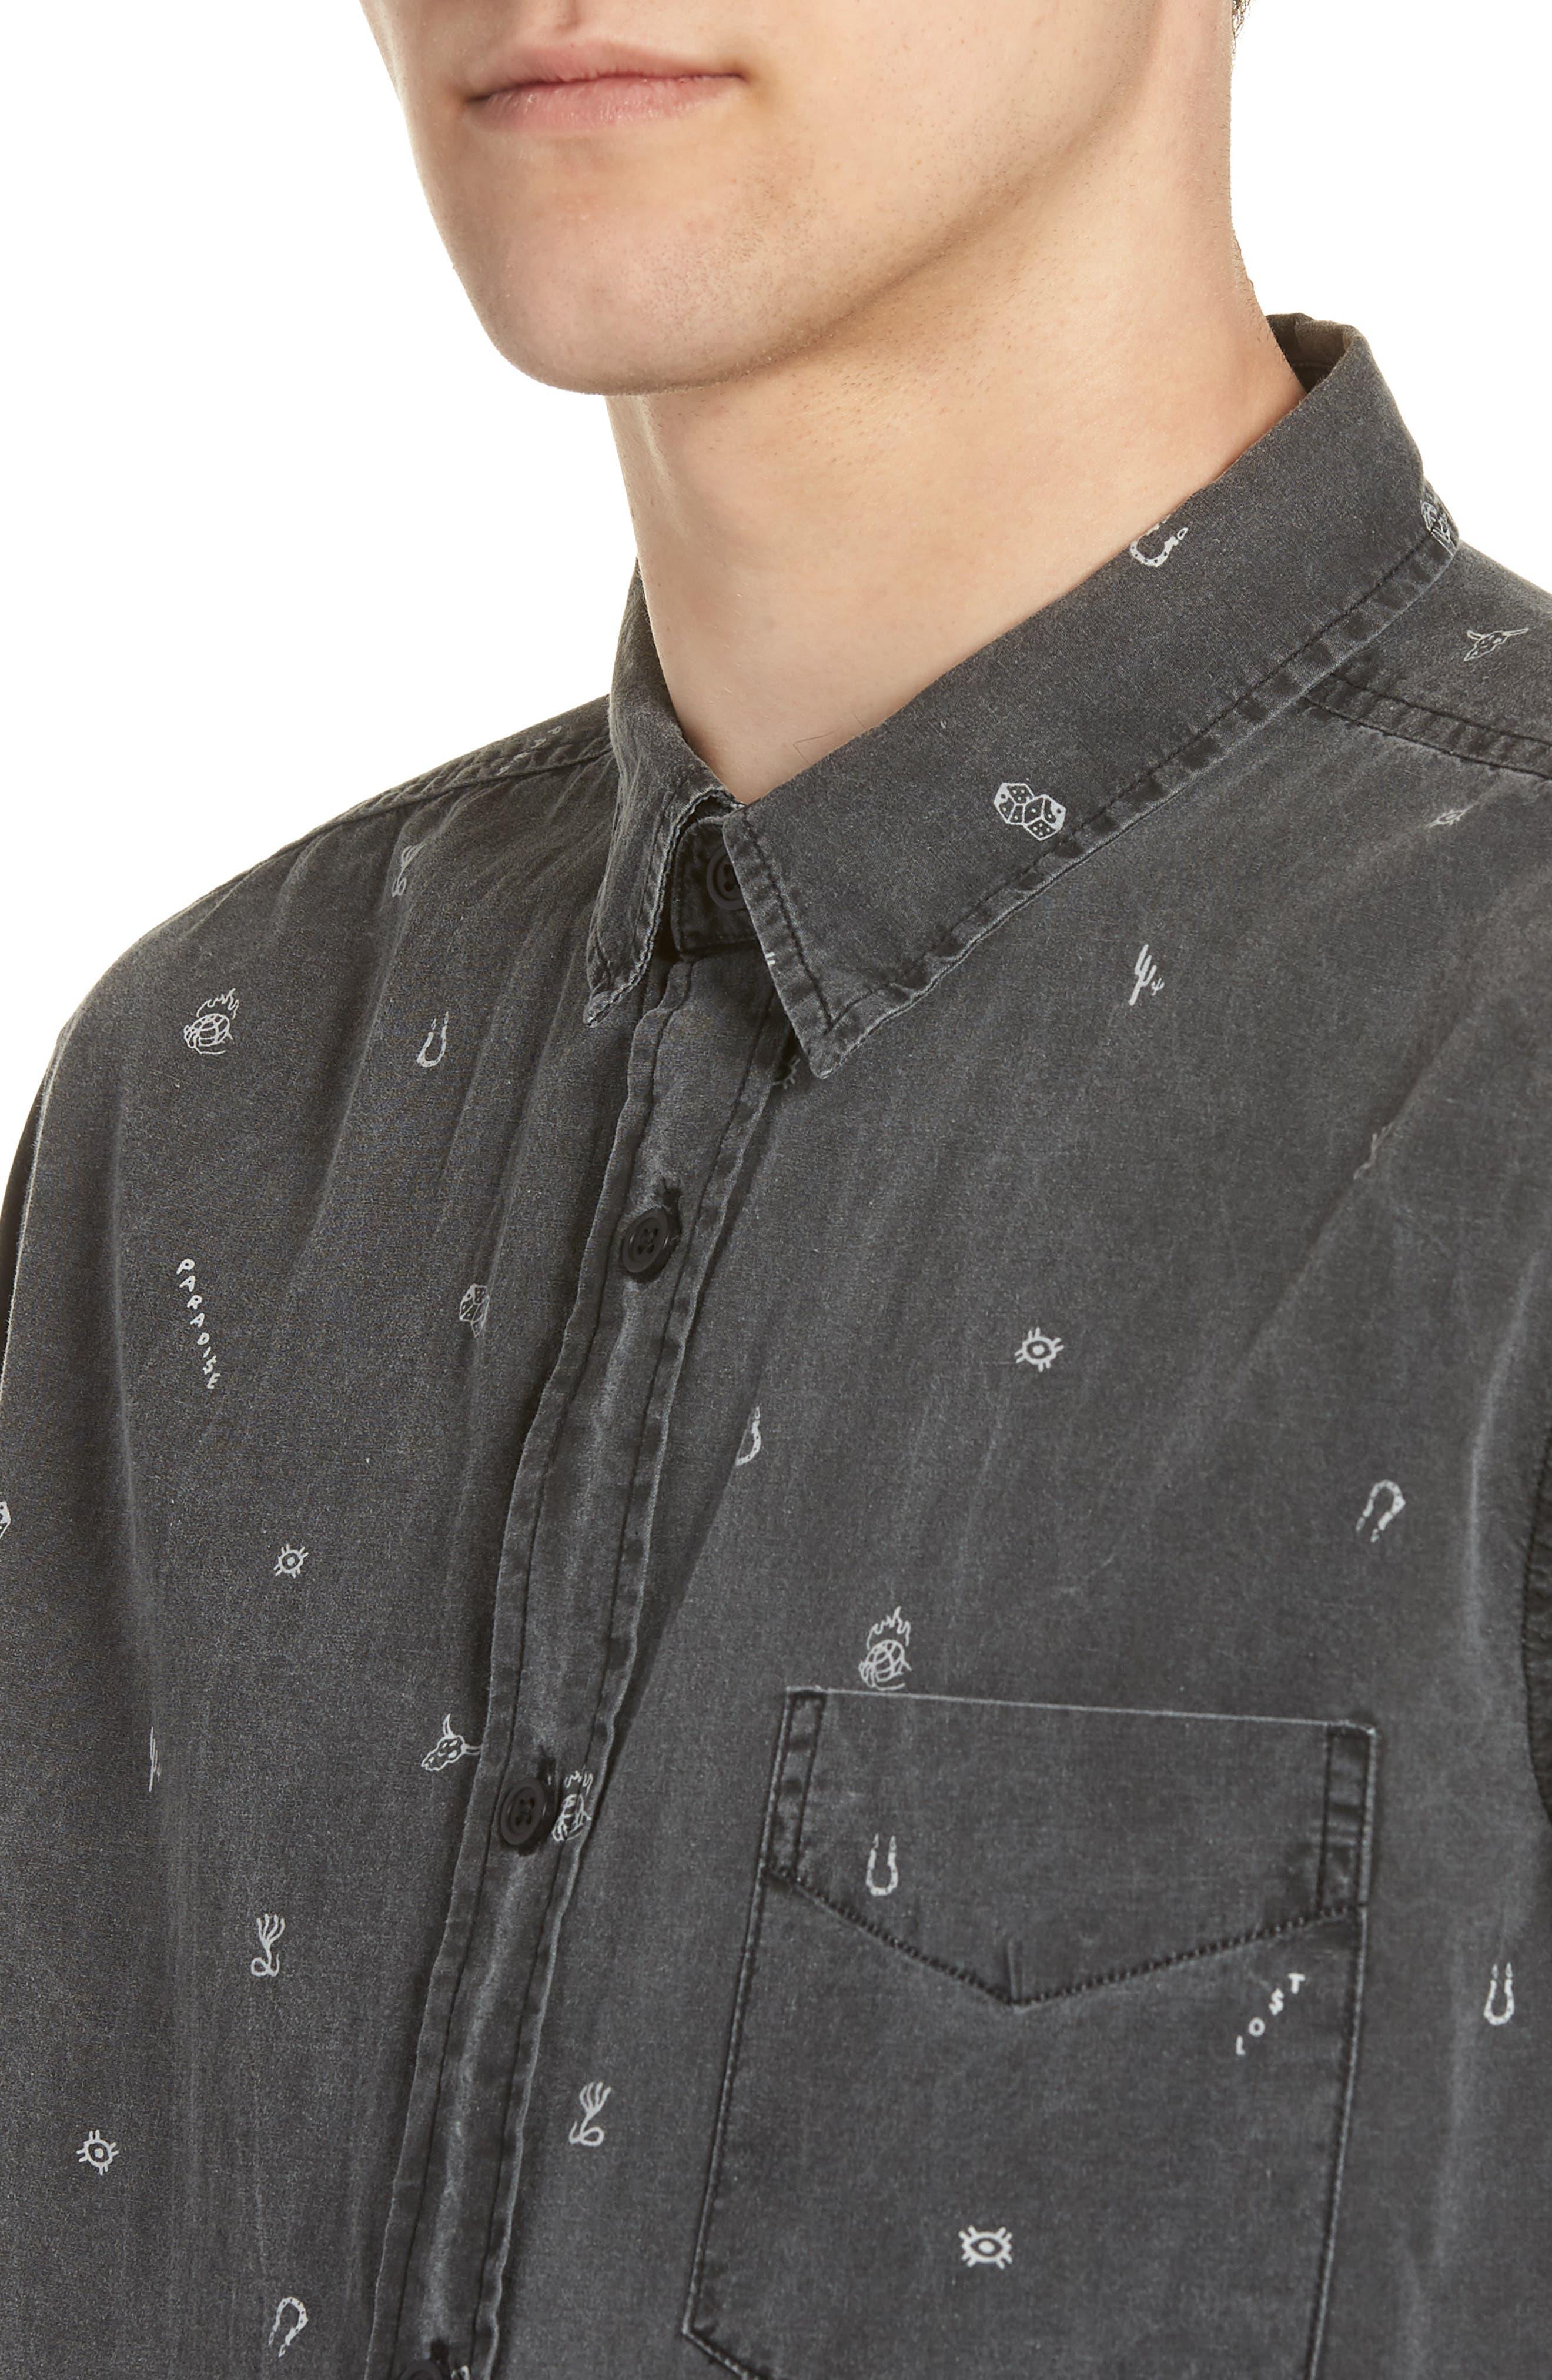 Vegas Woven Shirt,                             Alternate thumbnail 4, color,                             VINTAGE BLACK